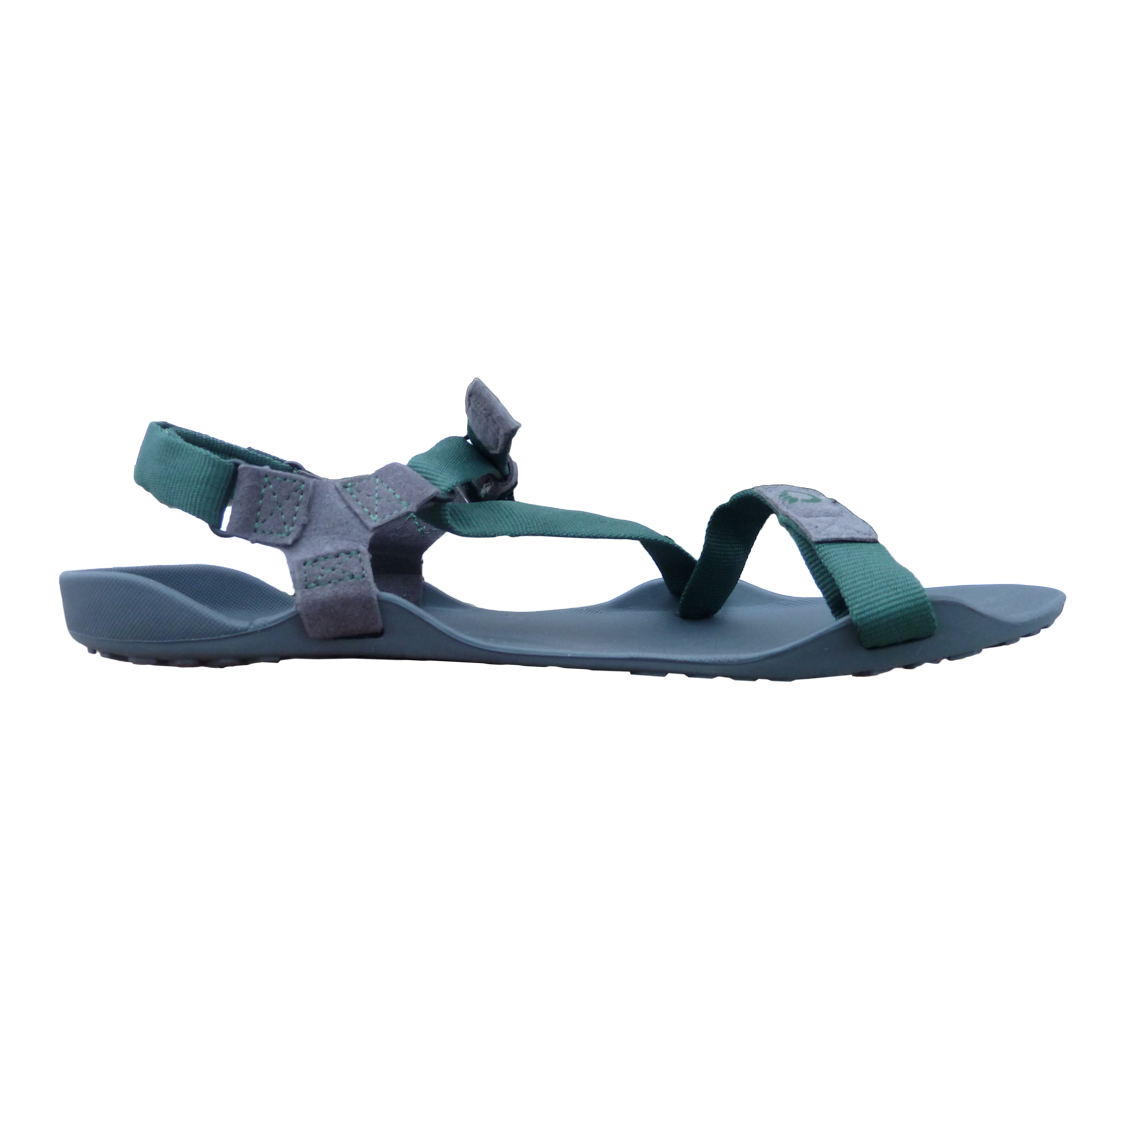 Creative Xero Shoes Amuri ZTrek Lightweight Sport Sandal  Men  EBay